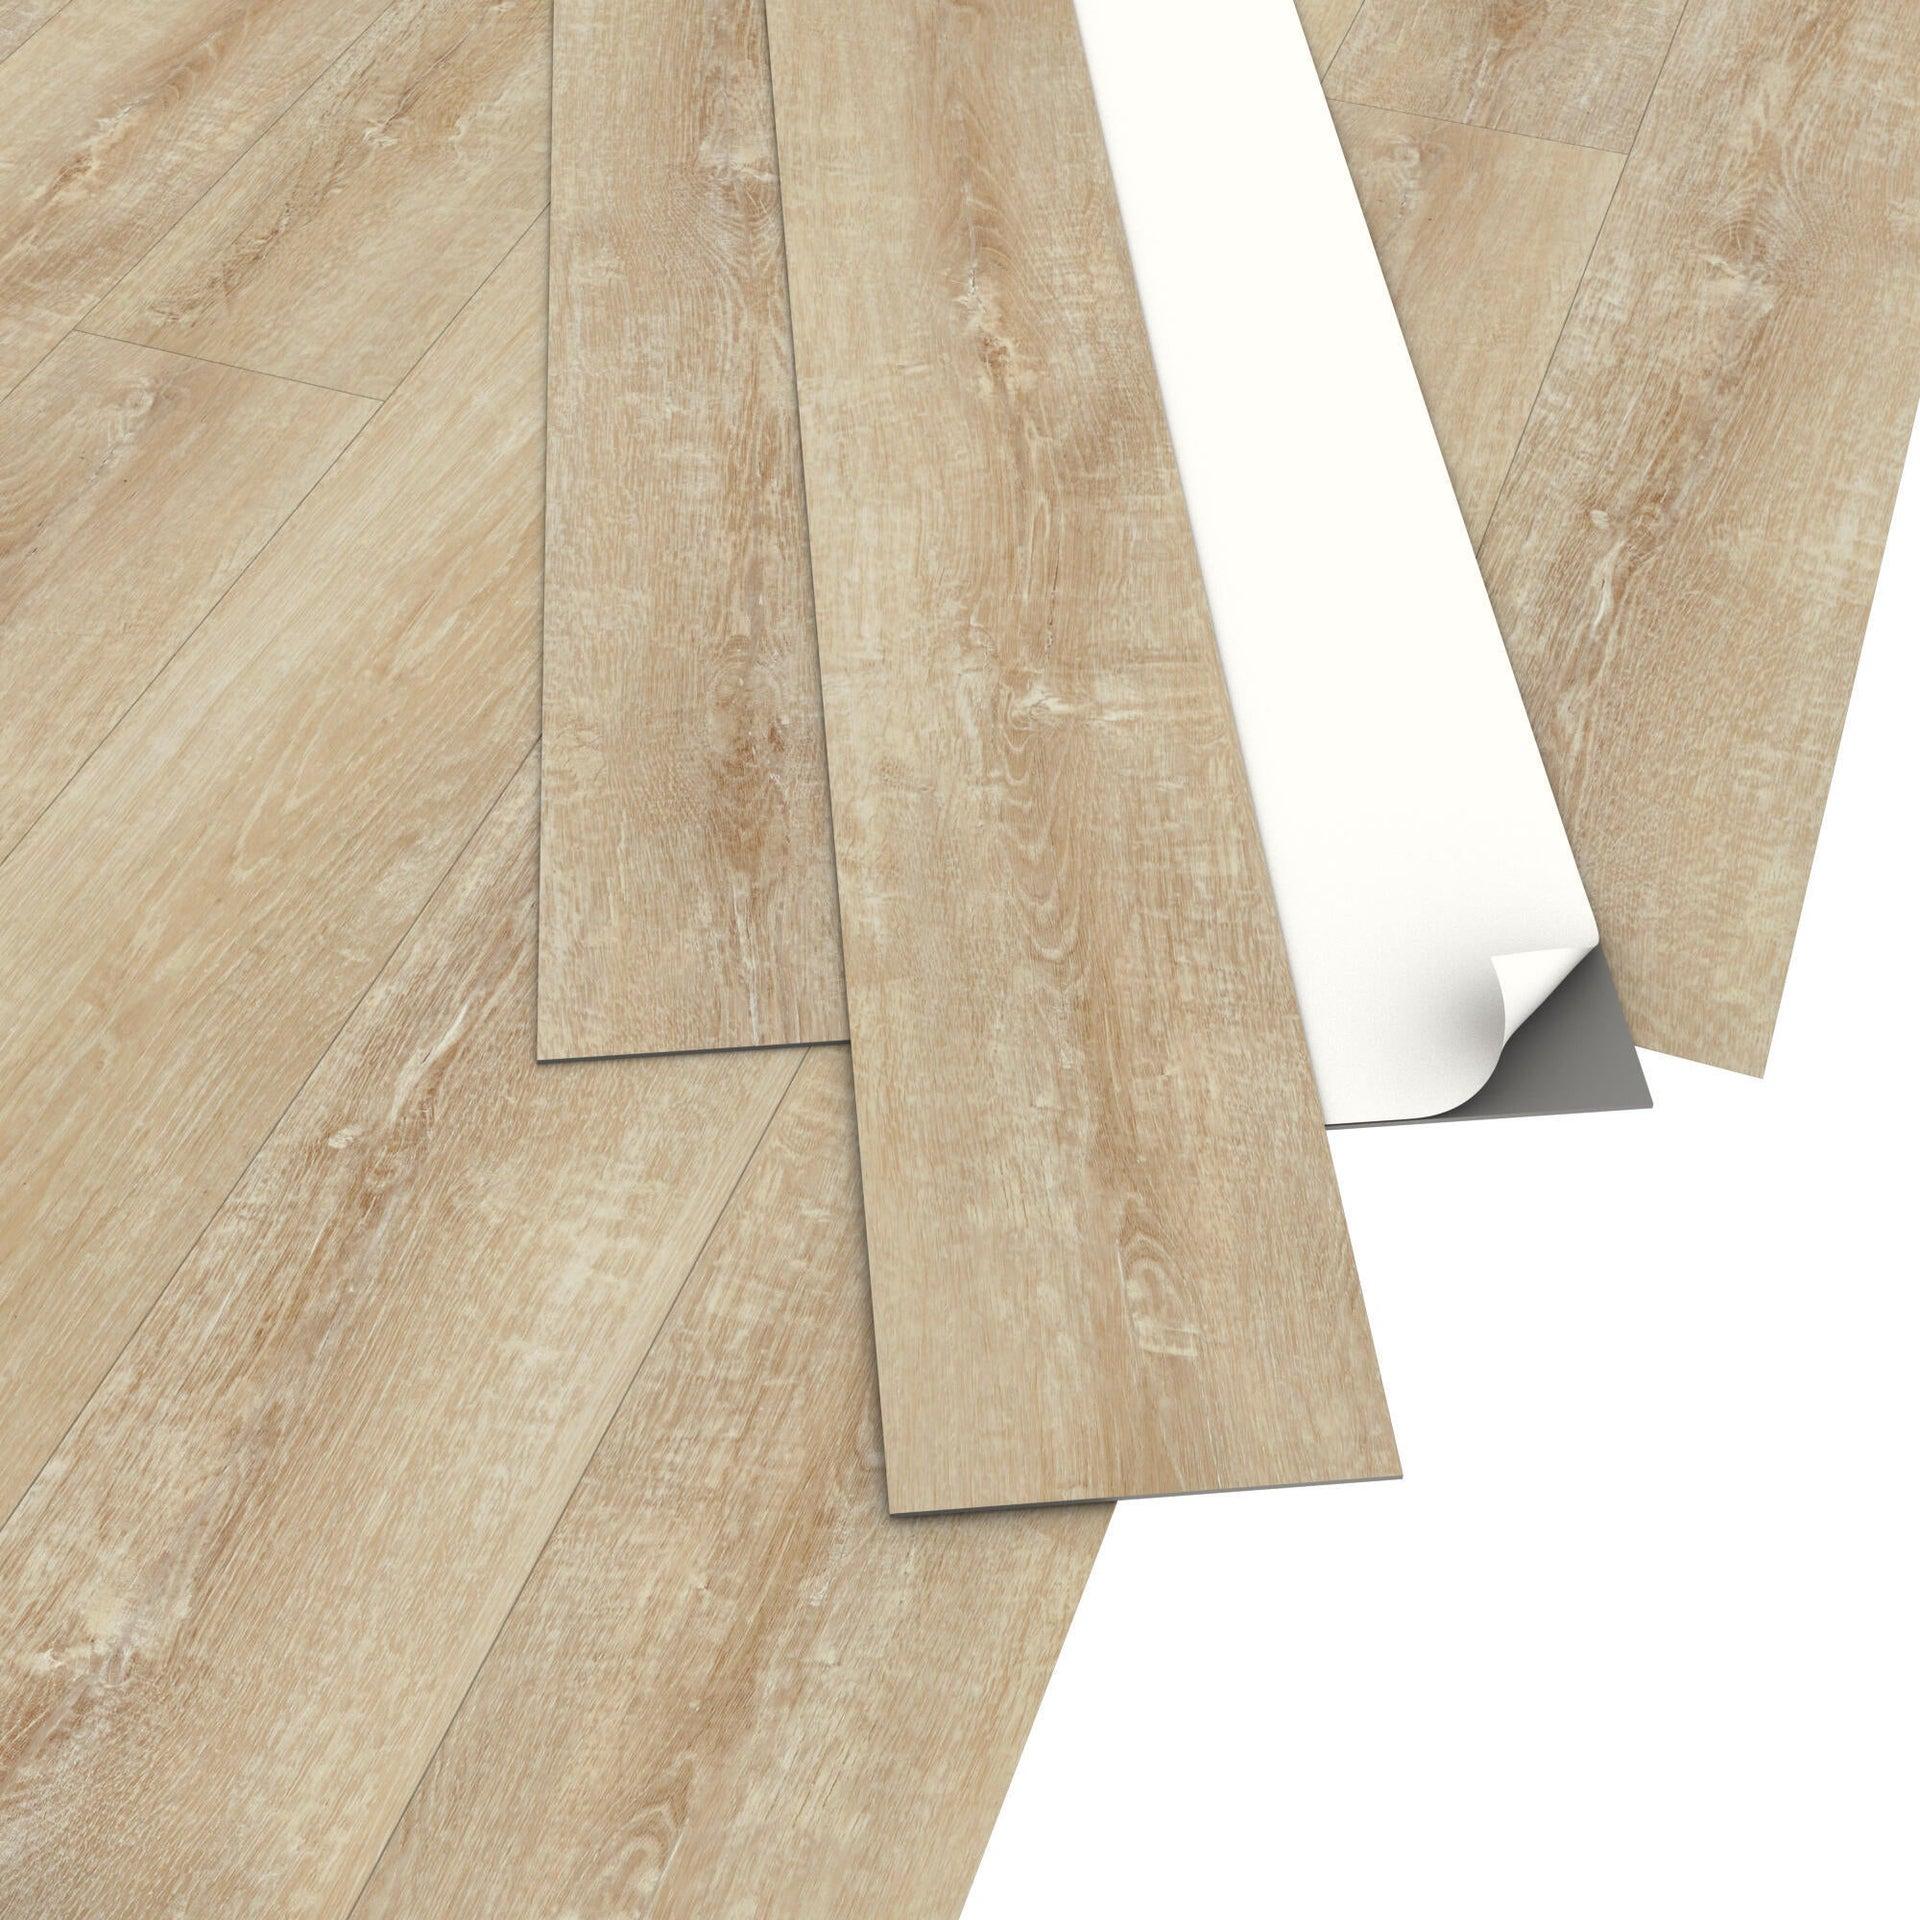 Pavimento PVC adesivo Senso Baladlight Sp 2.5 mm beige - 10